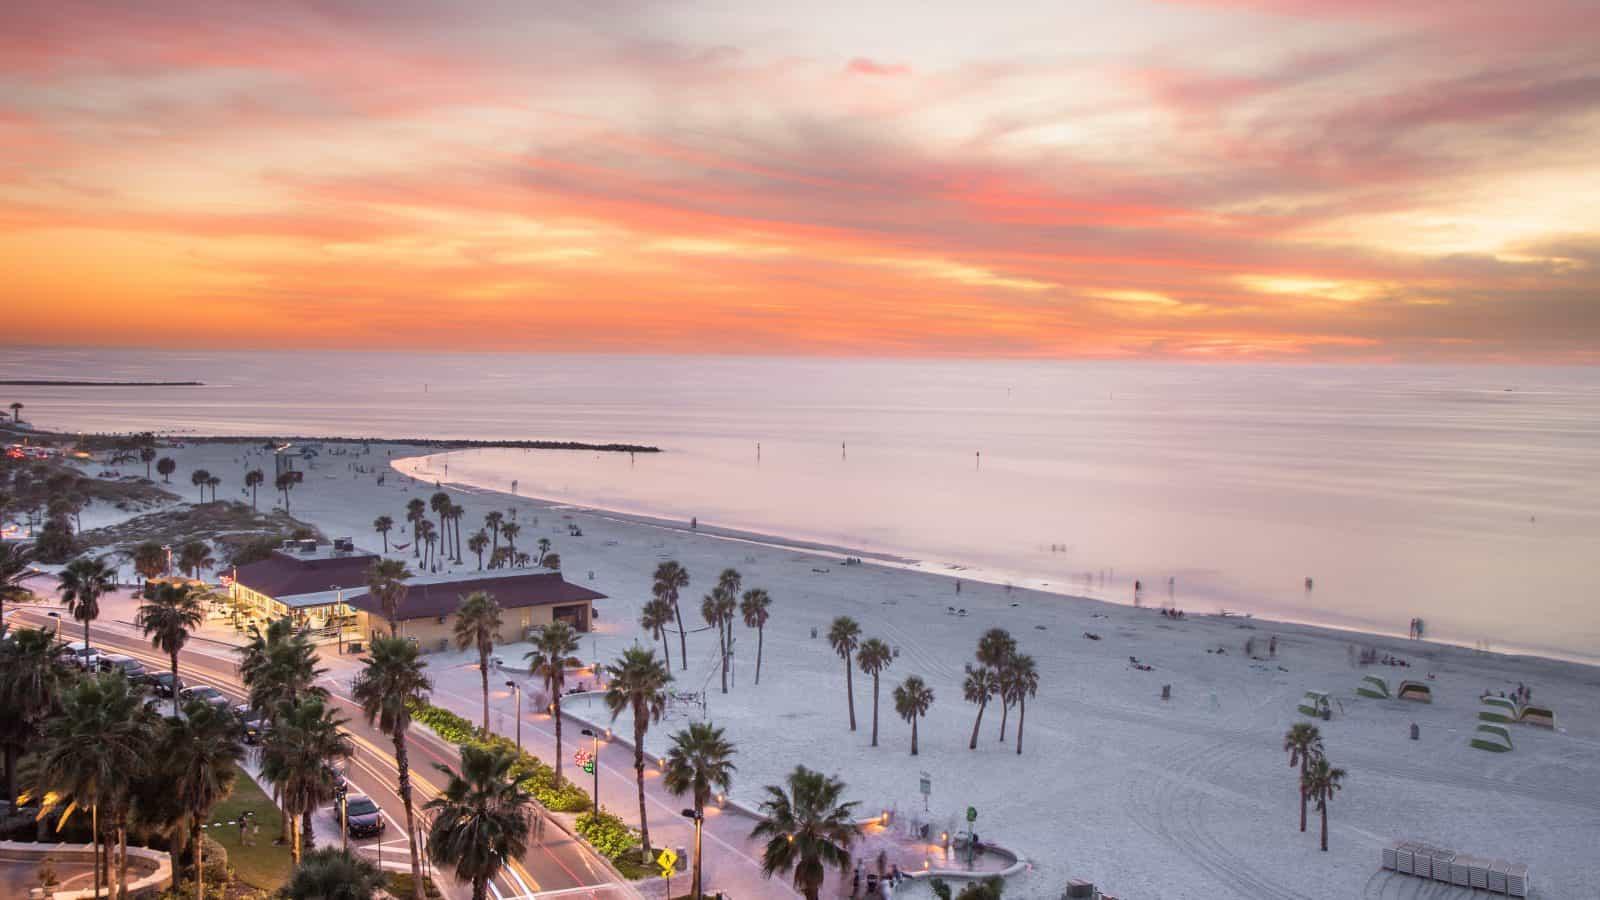 beaches-in-florida-clearwater-beach